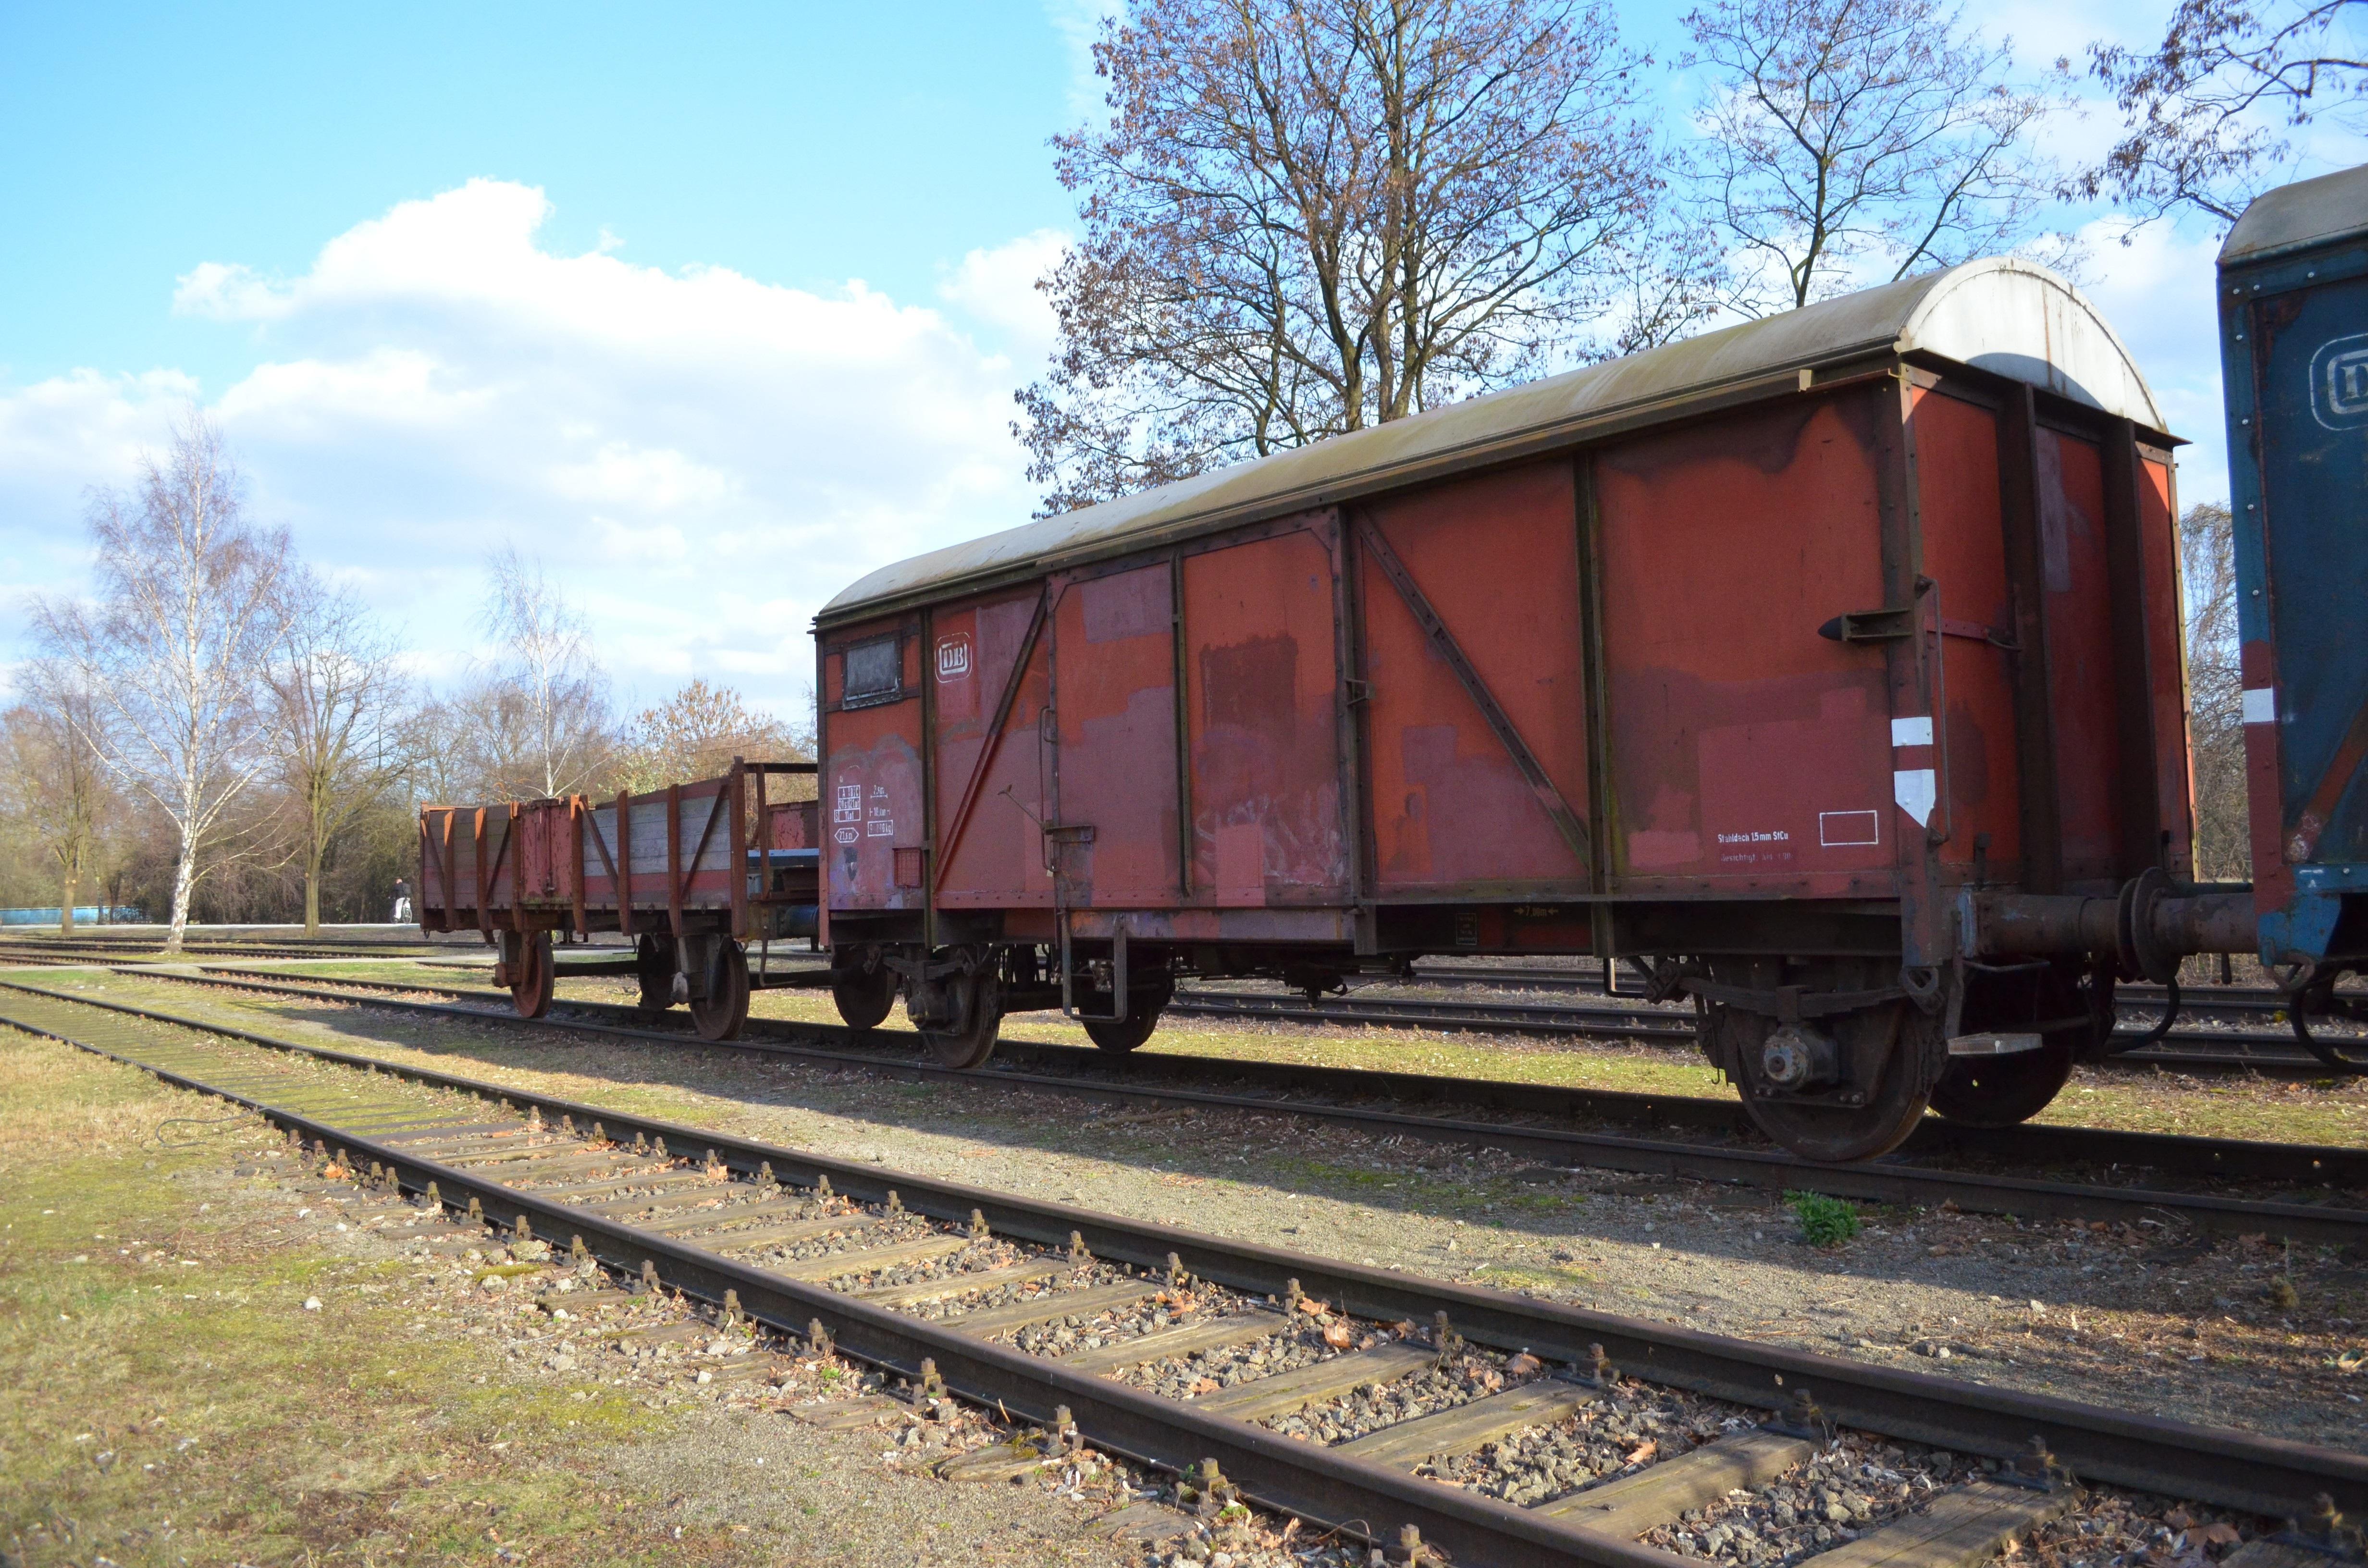 Fotograf Iz Yuk Vagonu Eski Tren Nakliye Arac Lokomotif